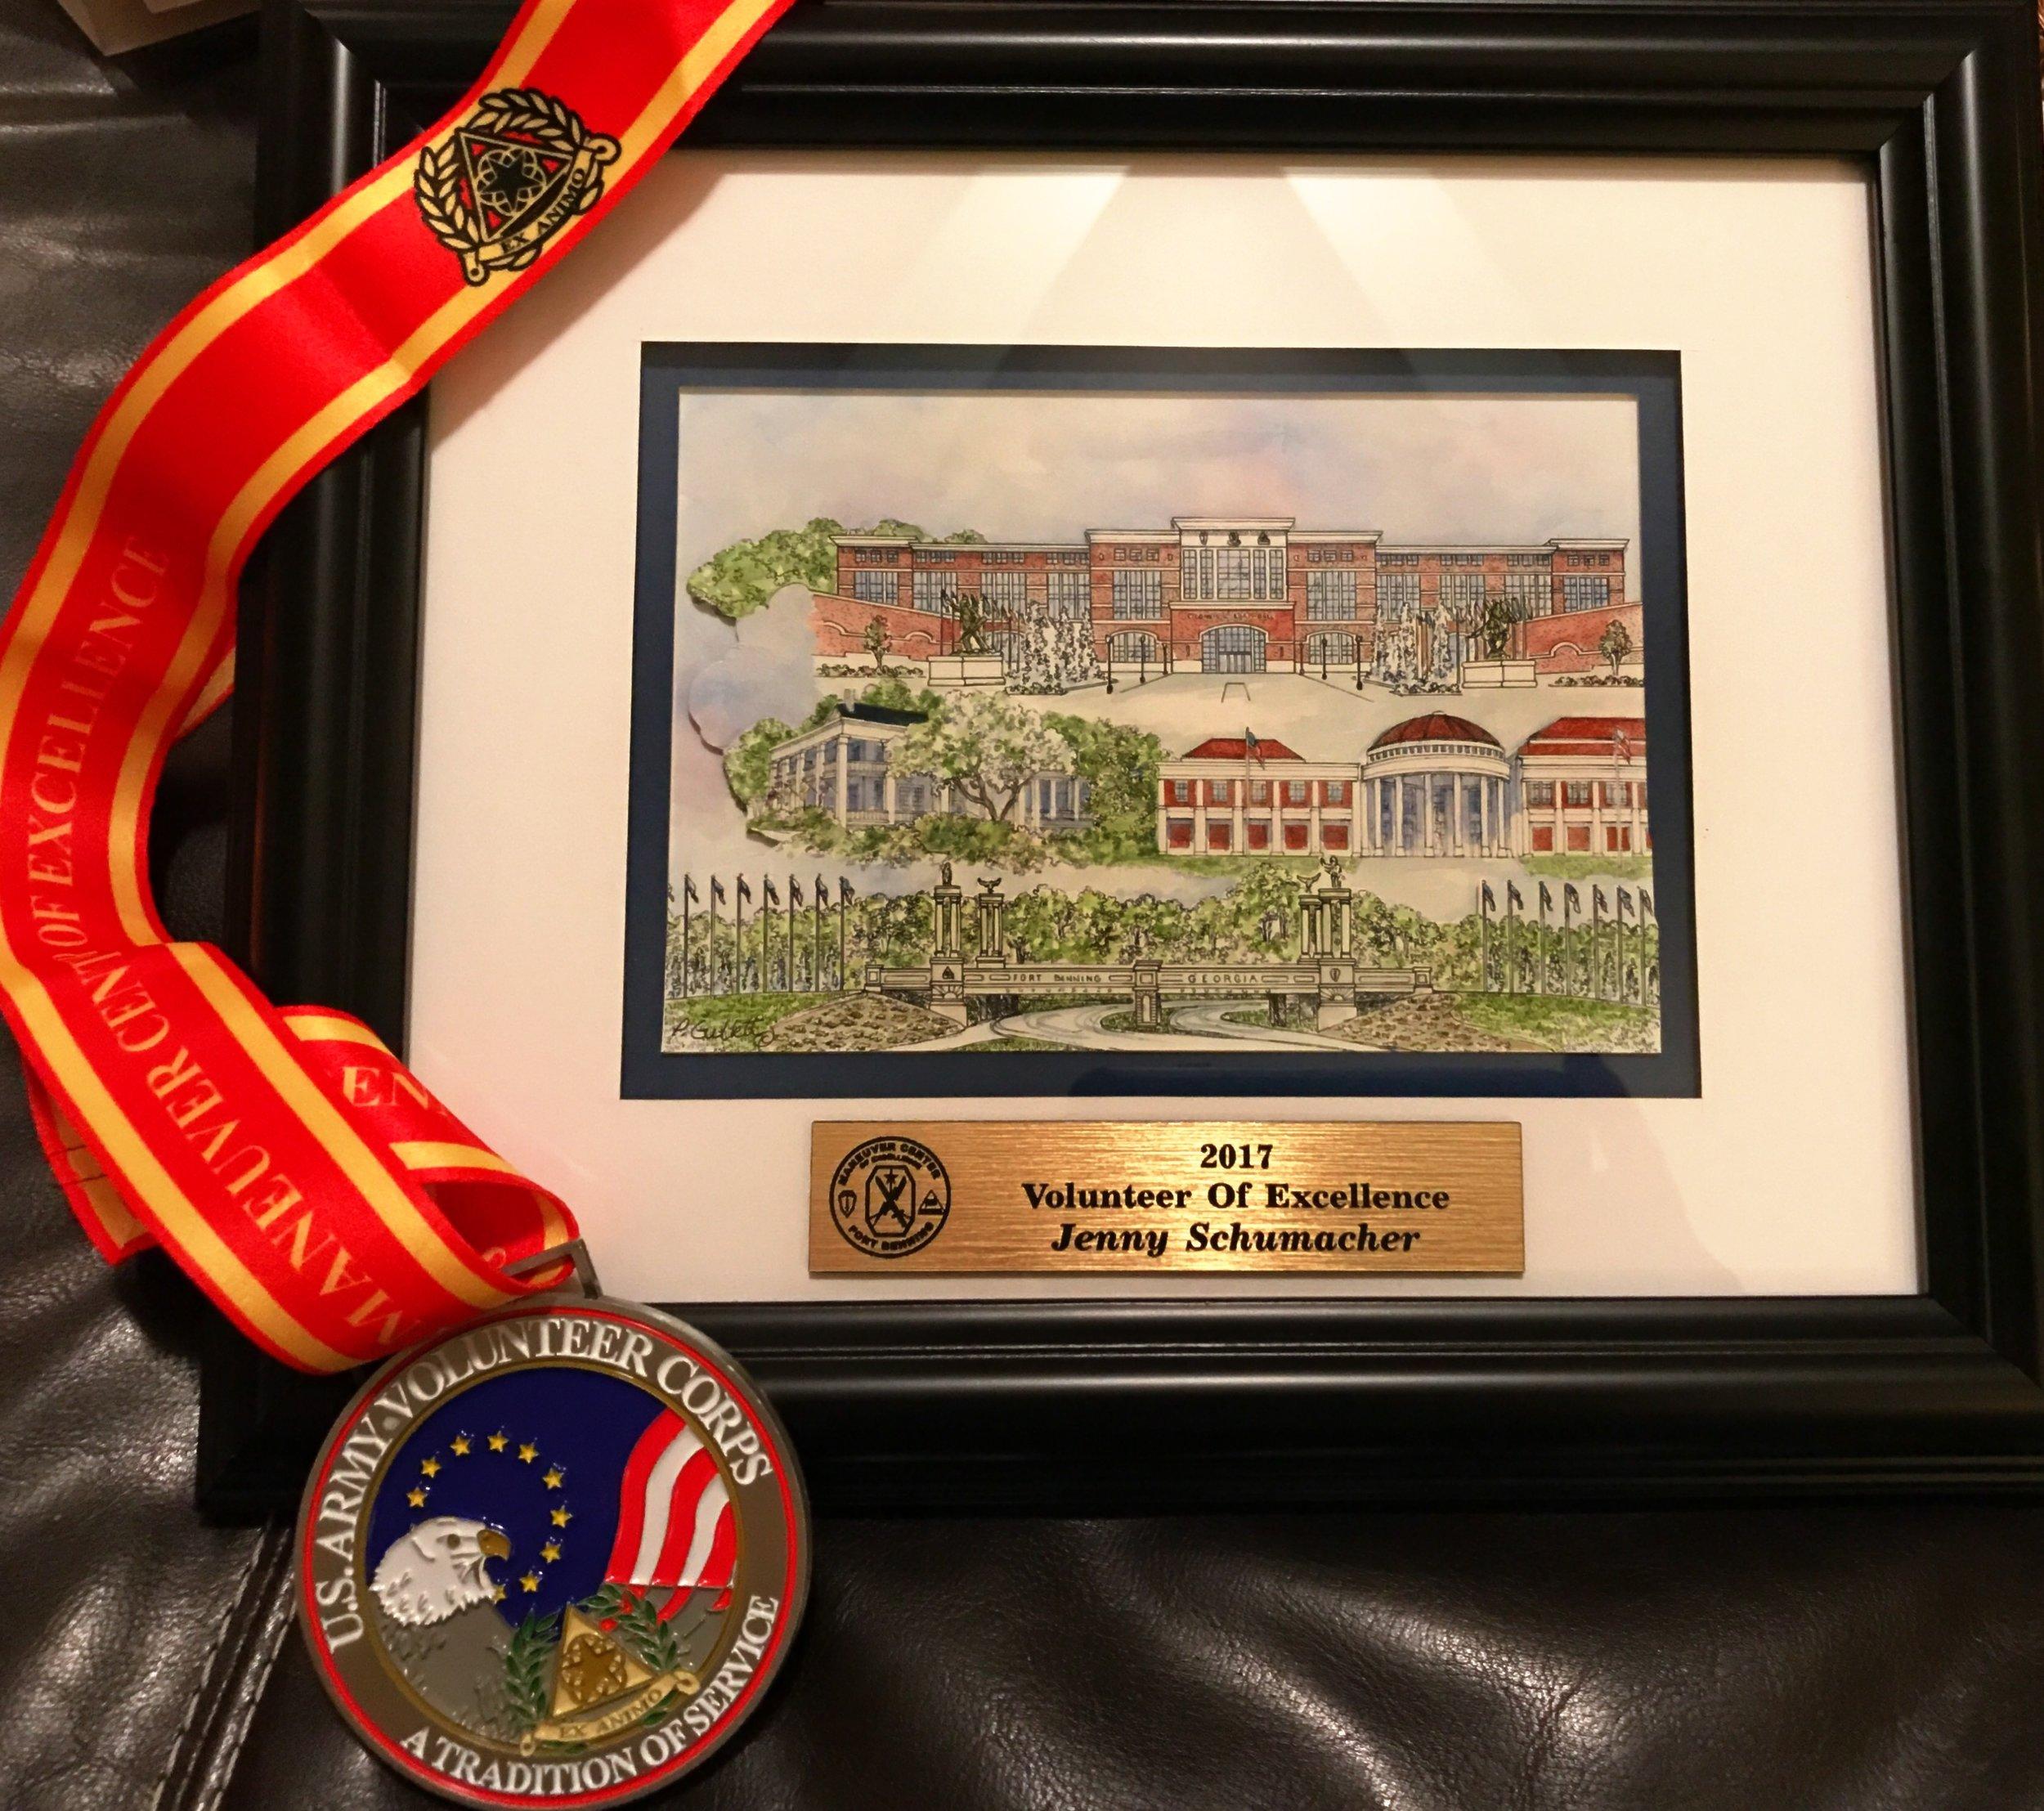 2017 Volunteer of Excellence Award